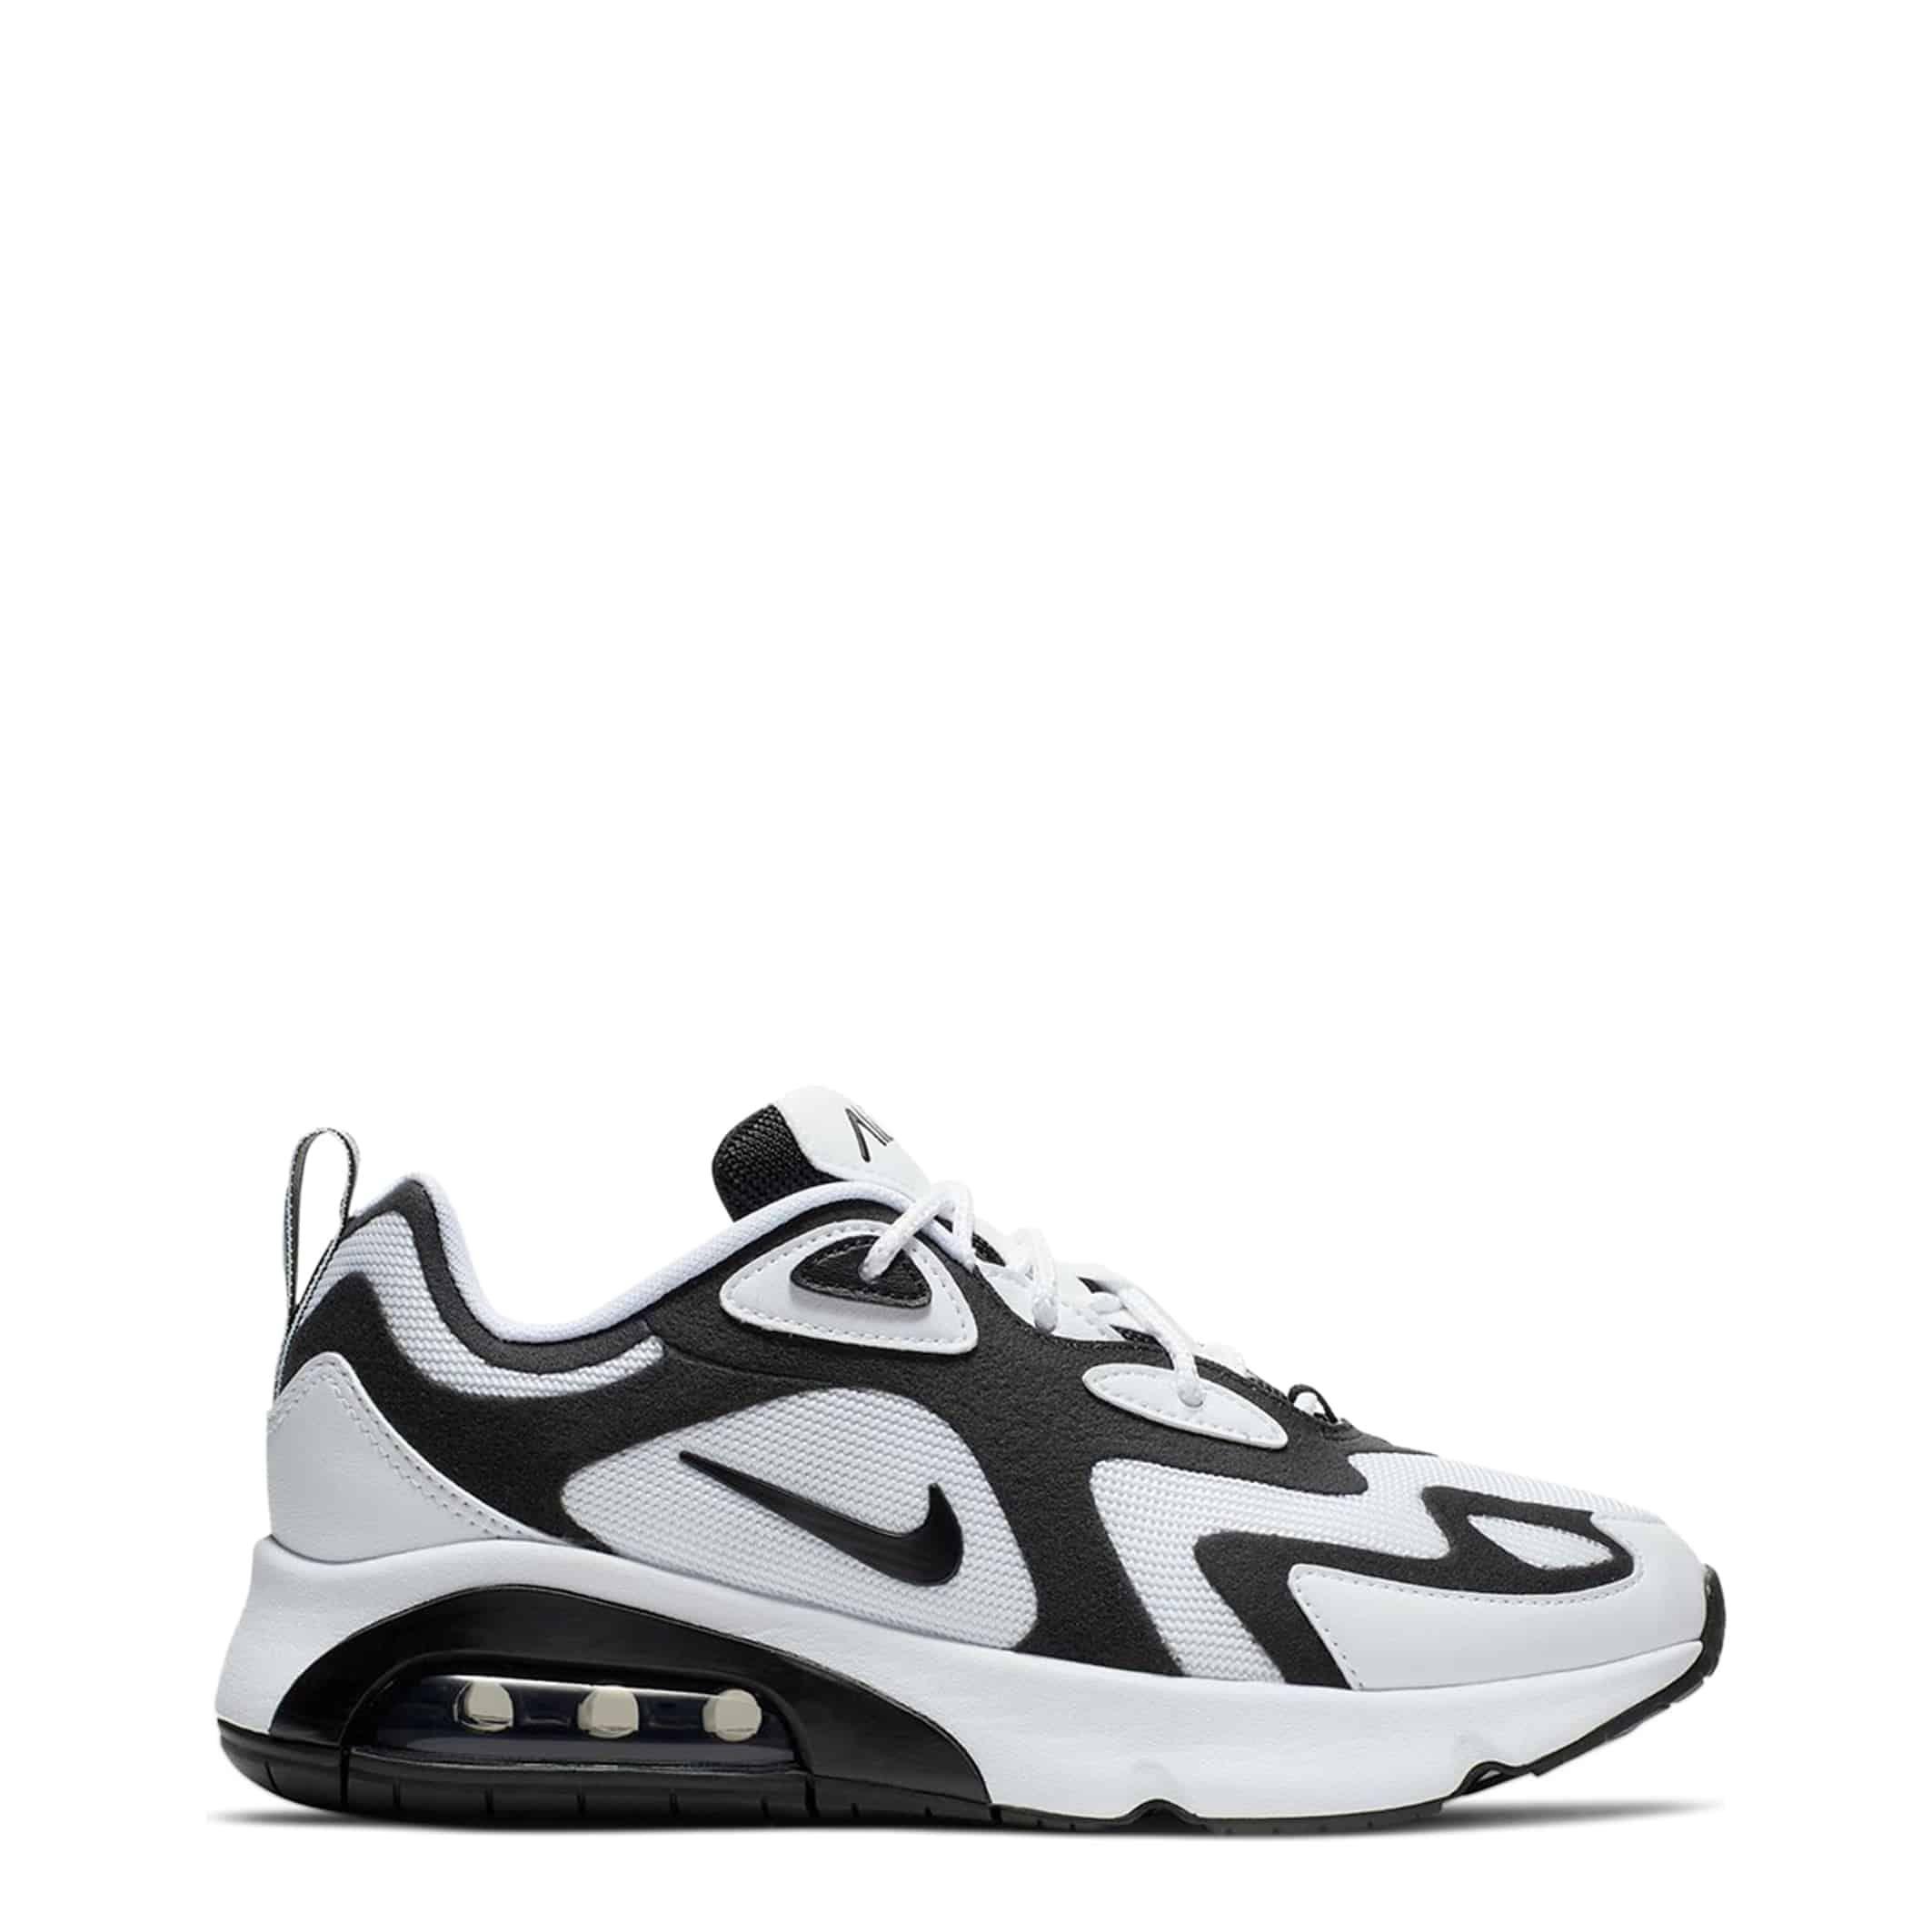 Nike - AirMax200